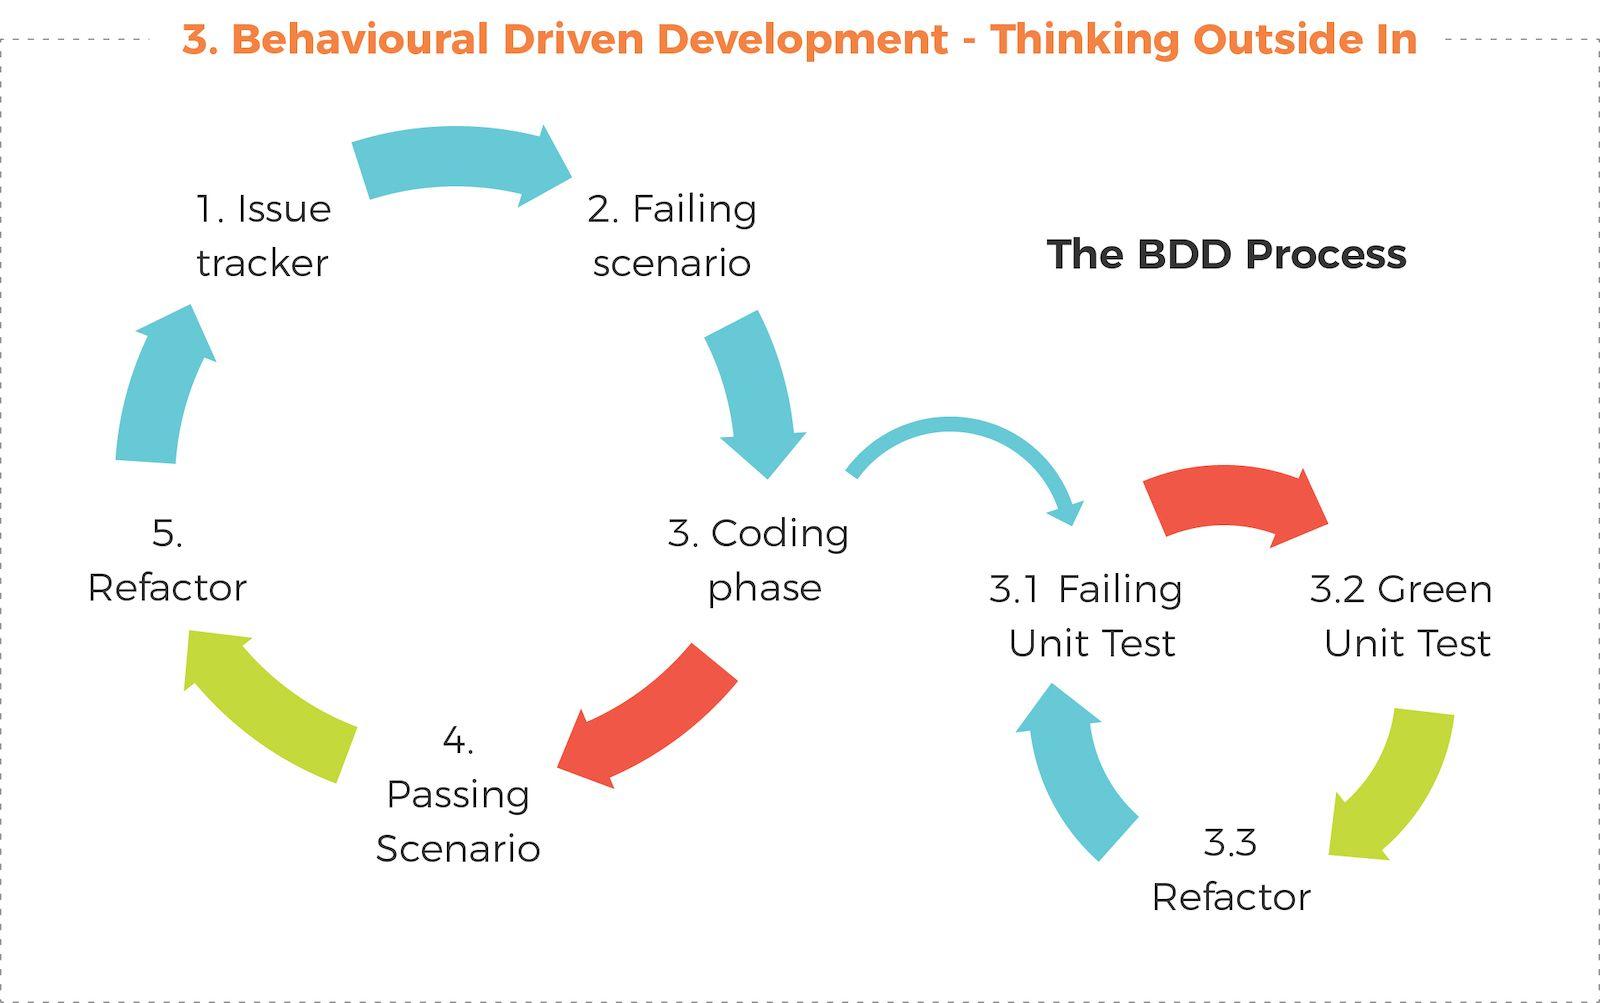 Behavioural Driven Development